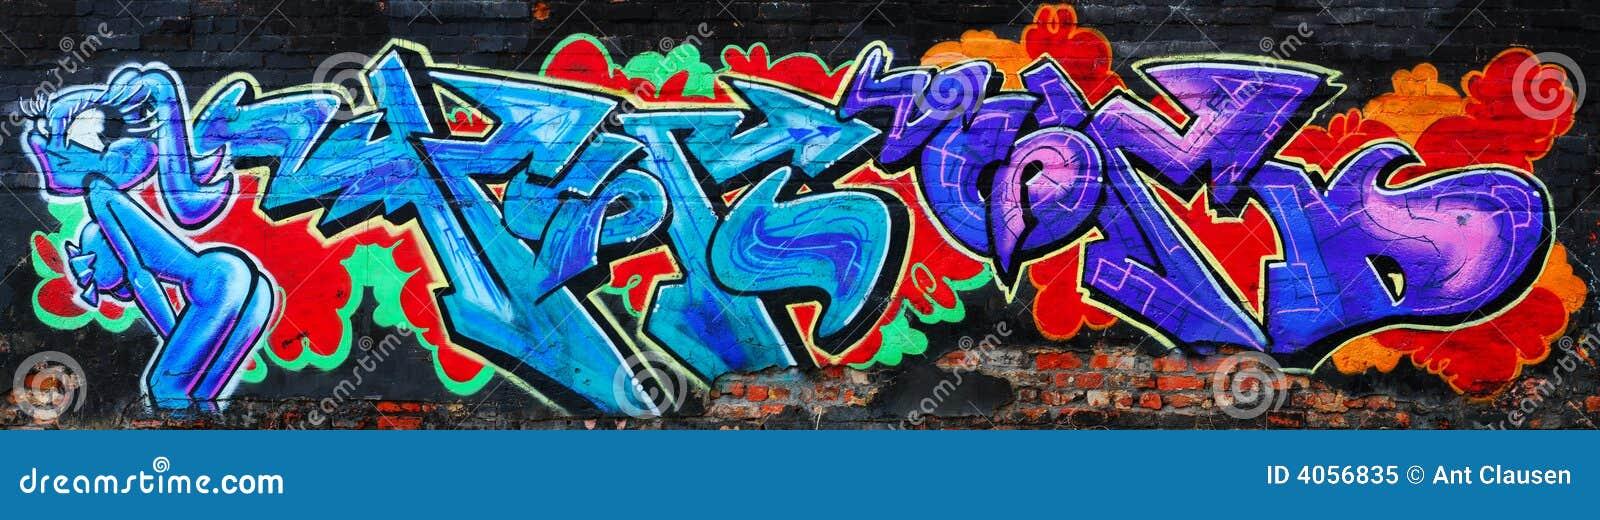 Graffiti urbani variopinti stupefacenti